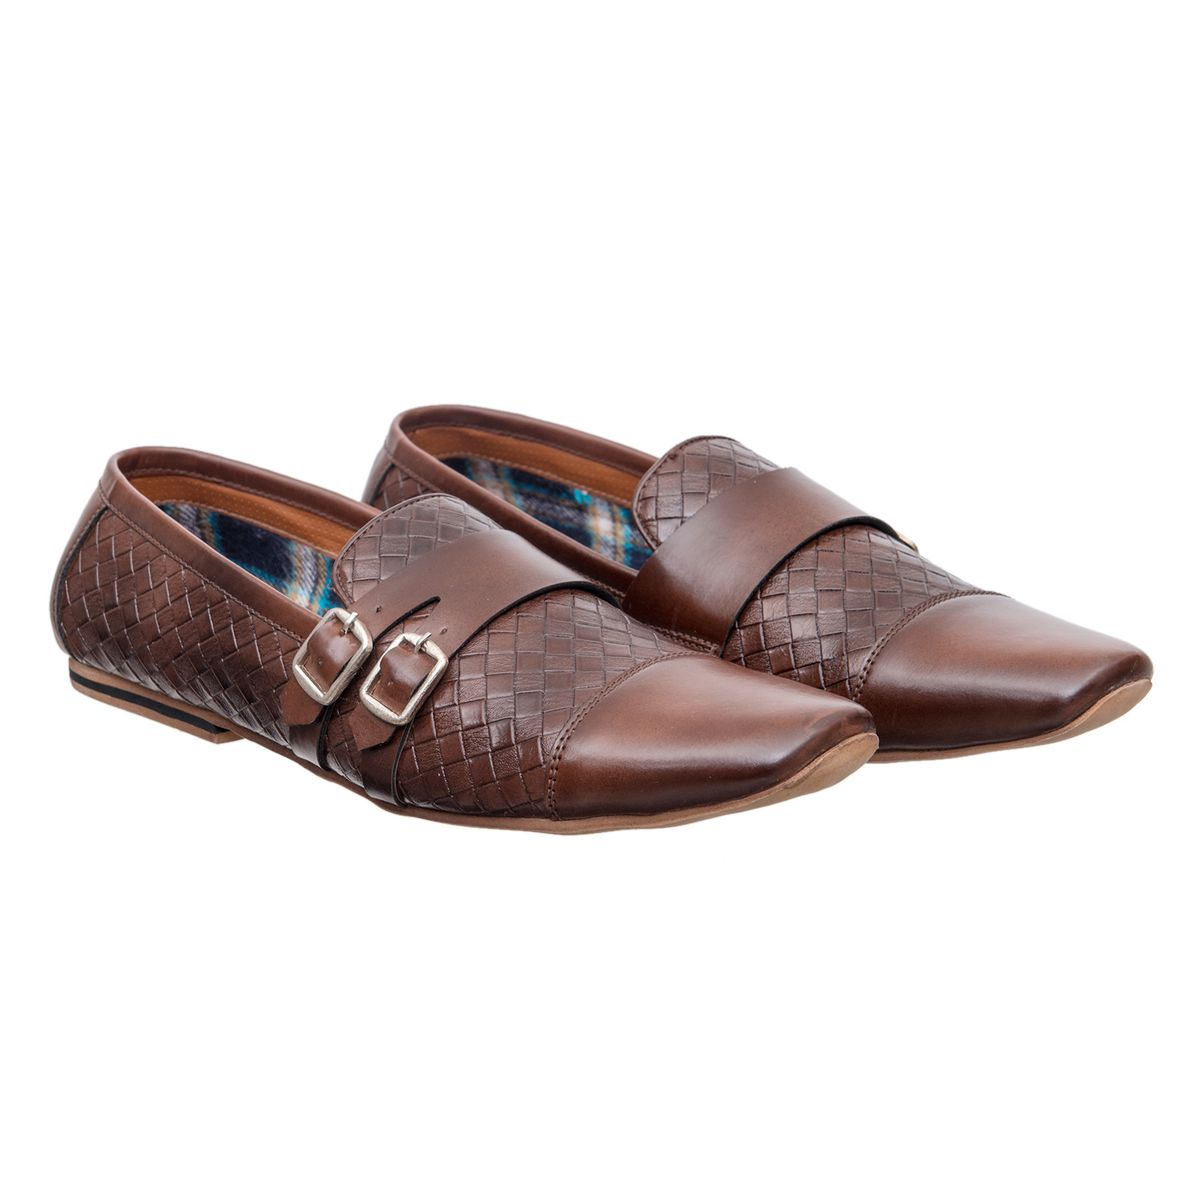 HV Monk Loafers